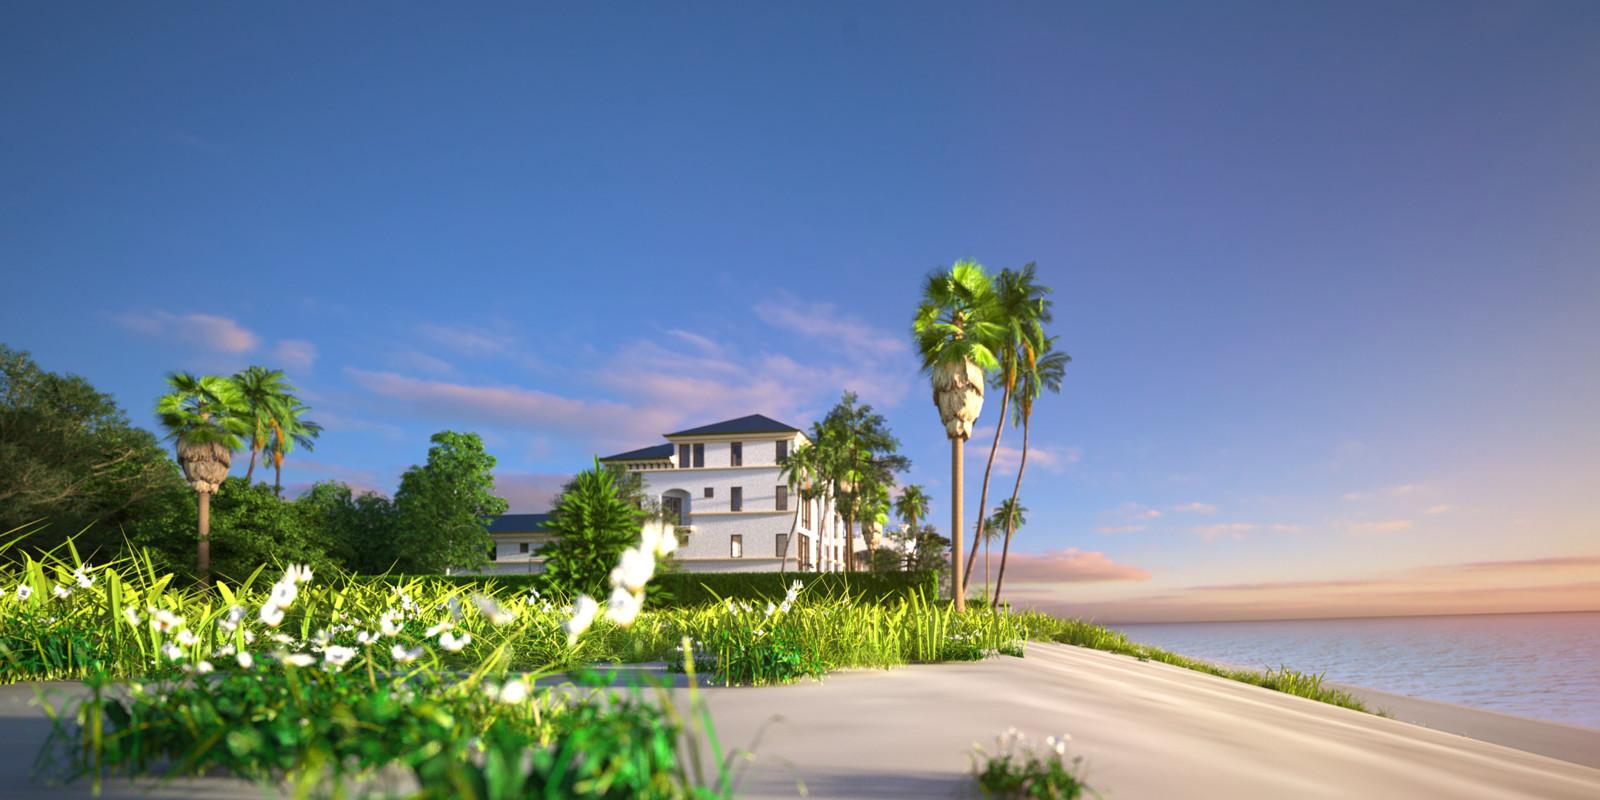 SketchUp + Thea Render  Seagrove Beach House: Scene 33 A Shade 2160 × 1080 Presto MC Bucket